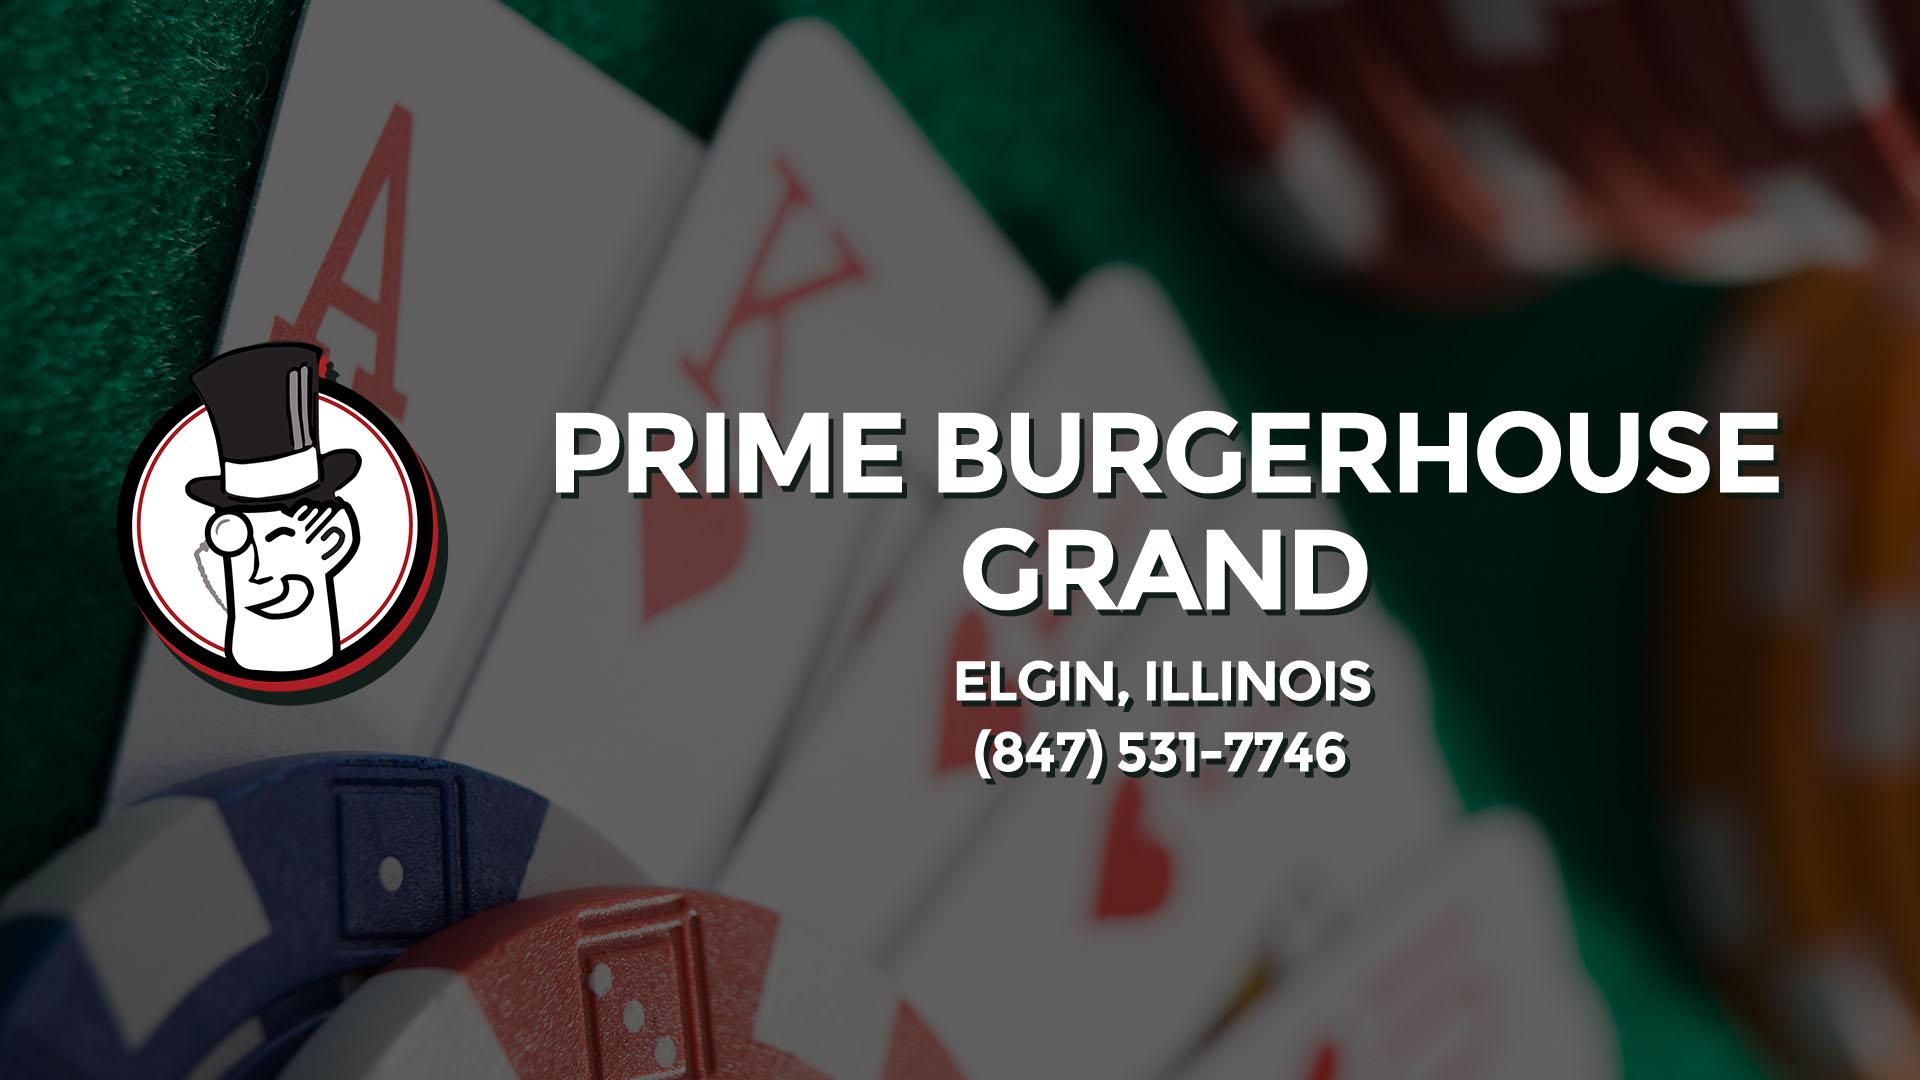 PRIME BURGERHOUSE-GRAND ELGIN IL